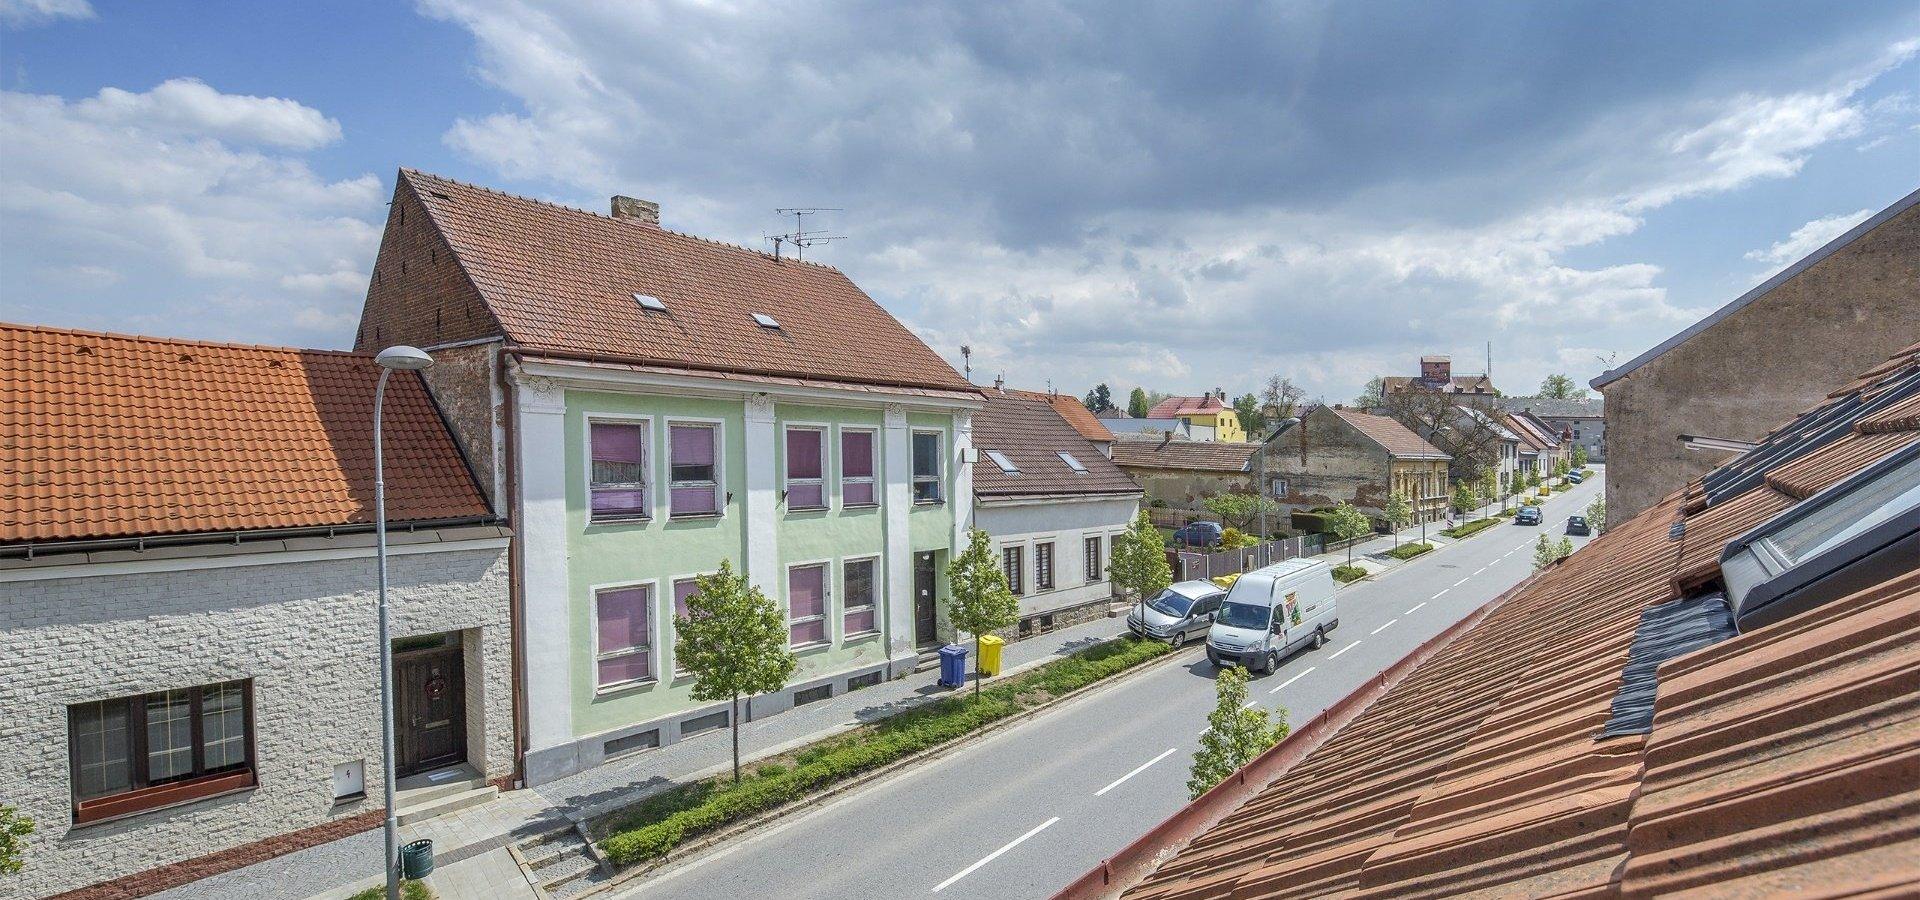 prodej-rodinneho-domu-na-bydleni-i-investici-477m2-telc-13merge-ada172